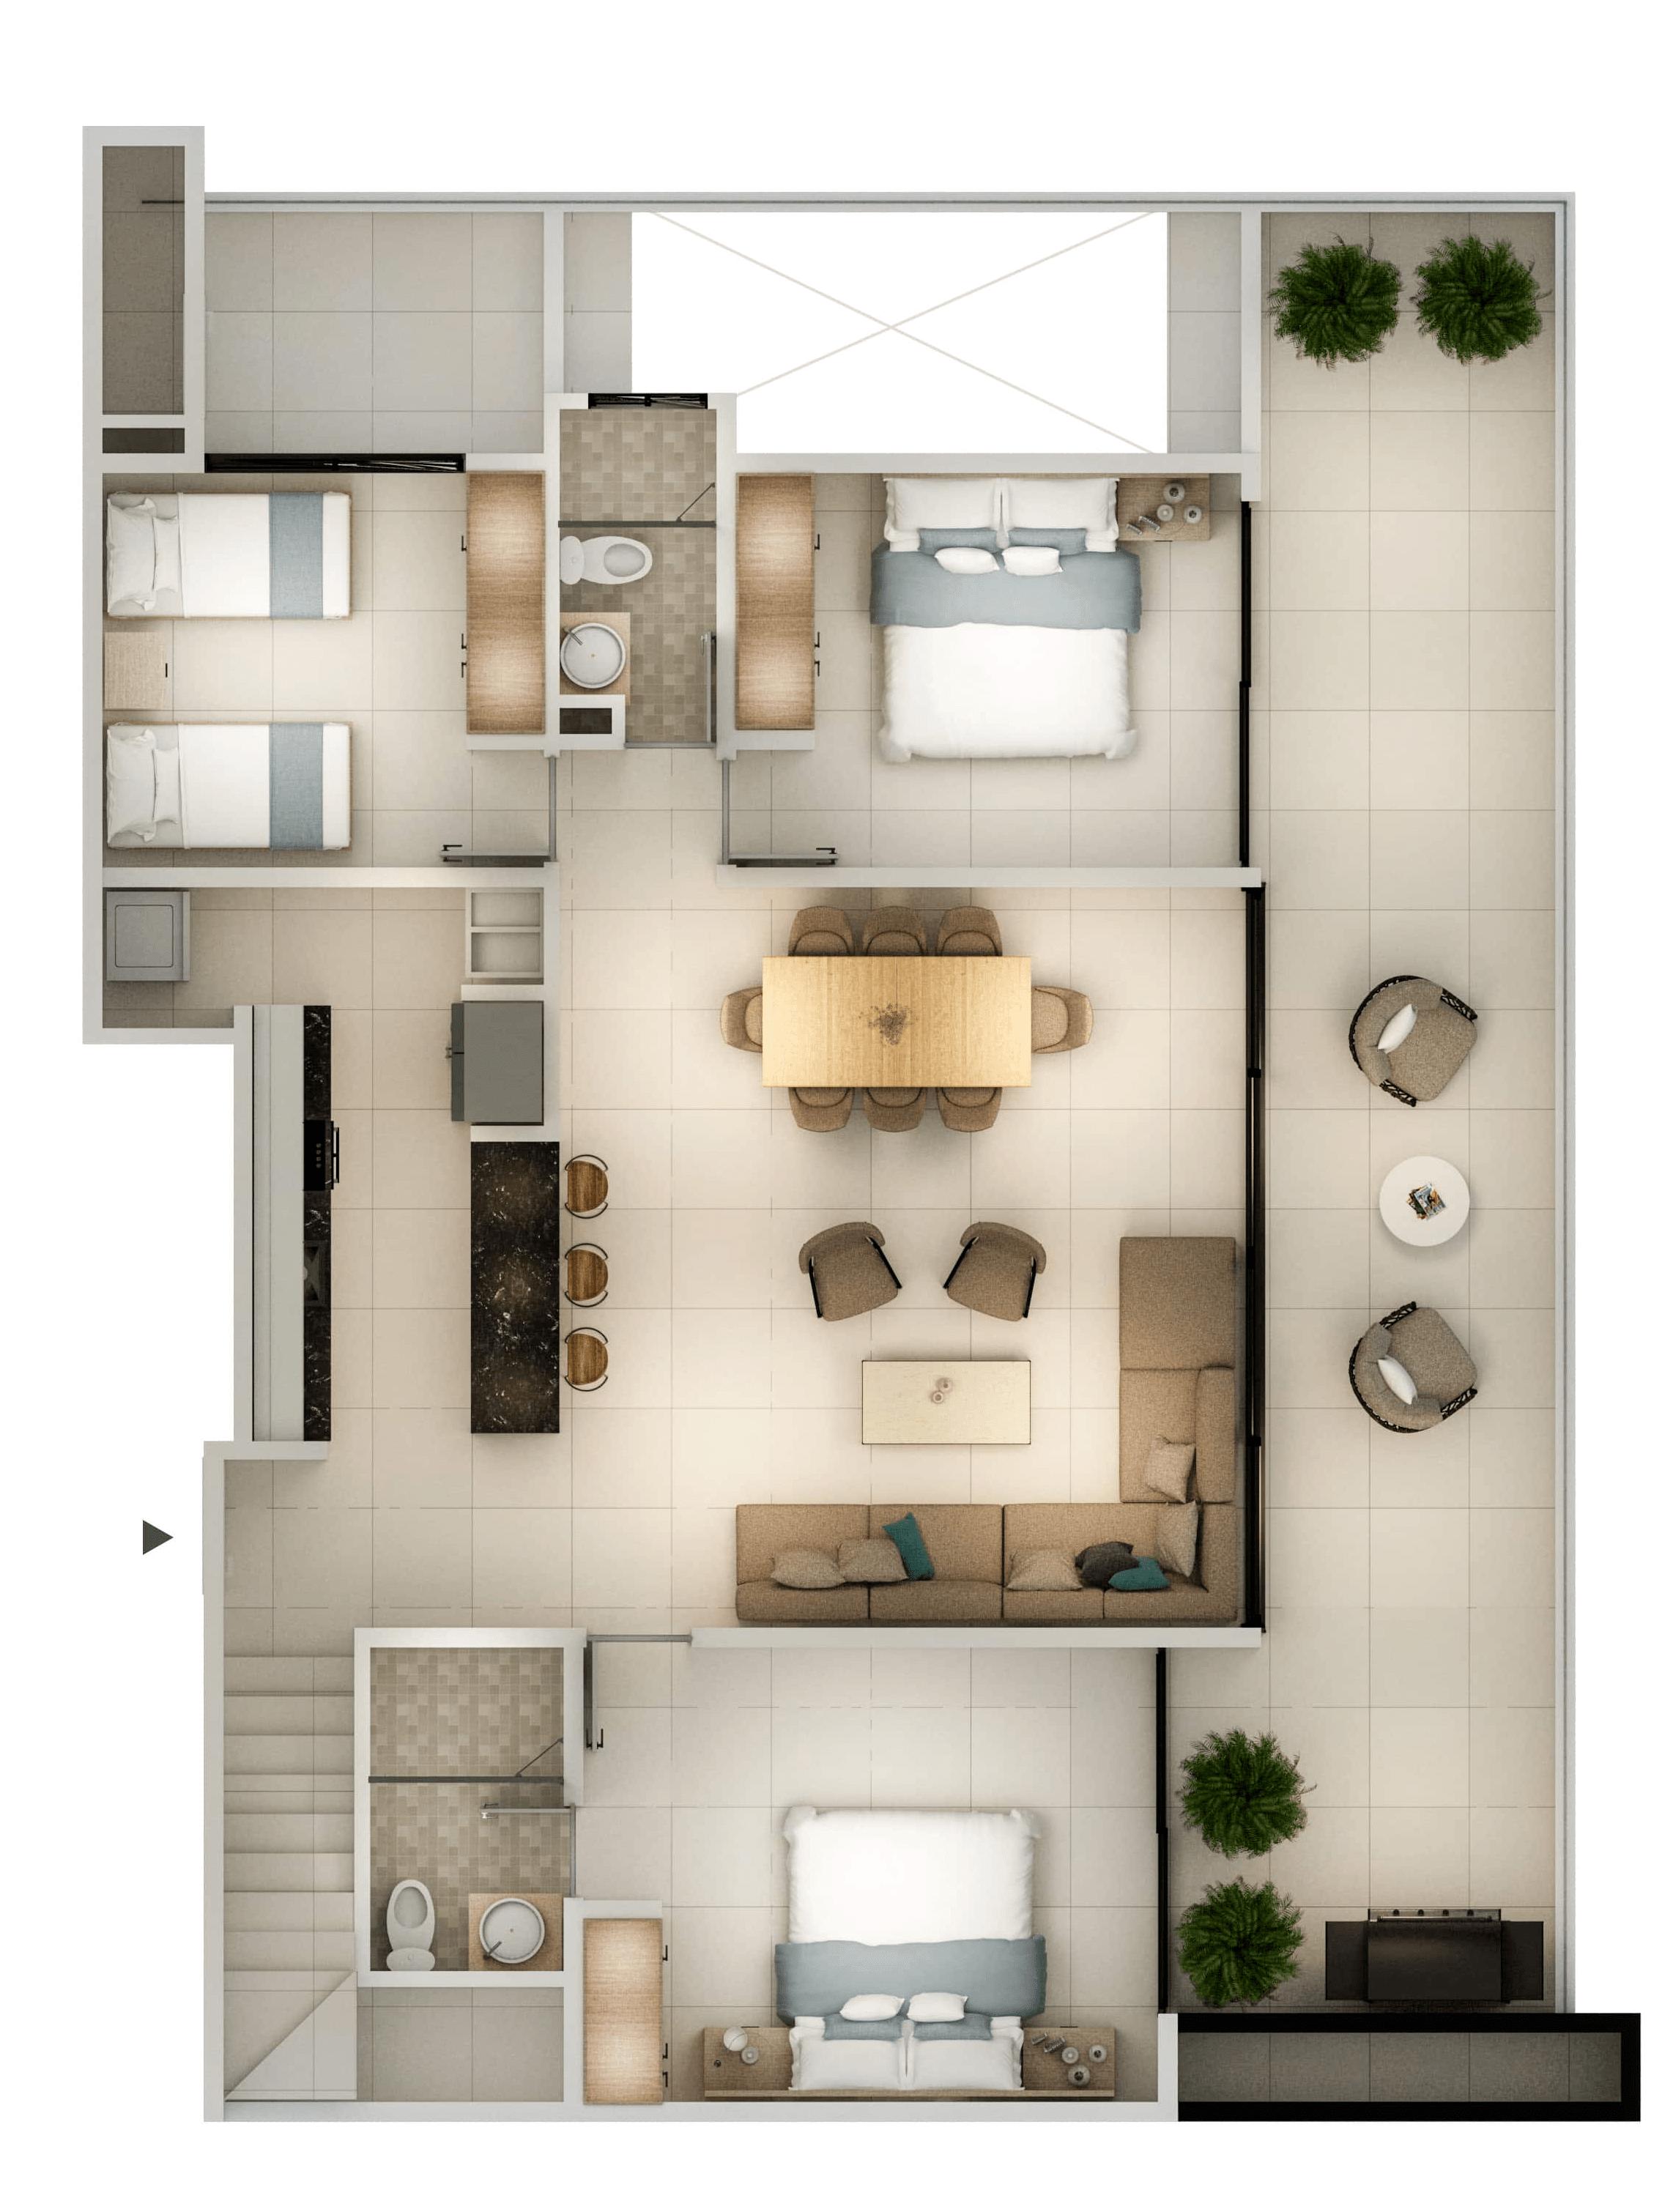 penthouse_5_alcobas_planta_0-min